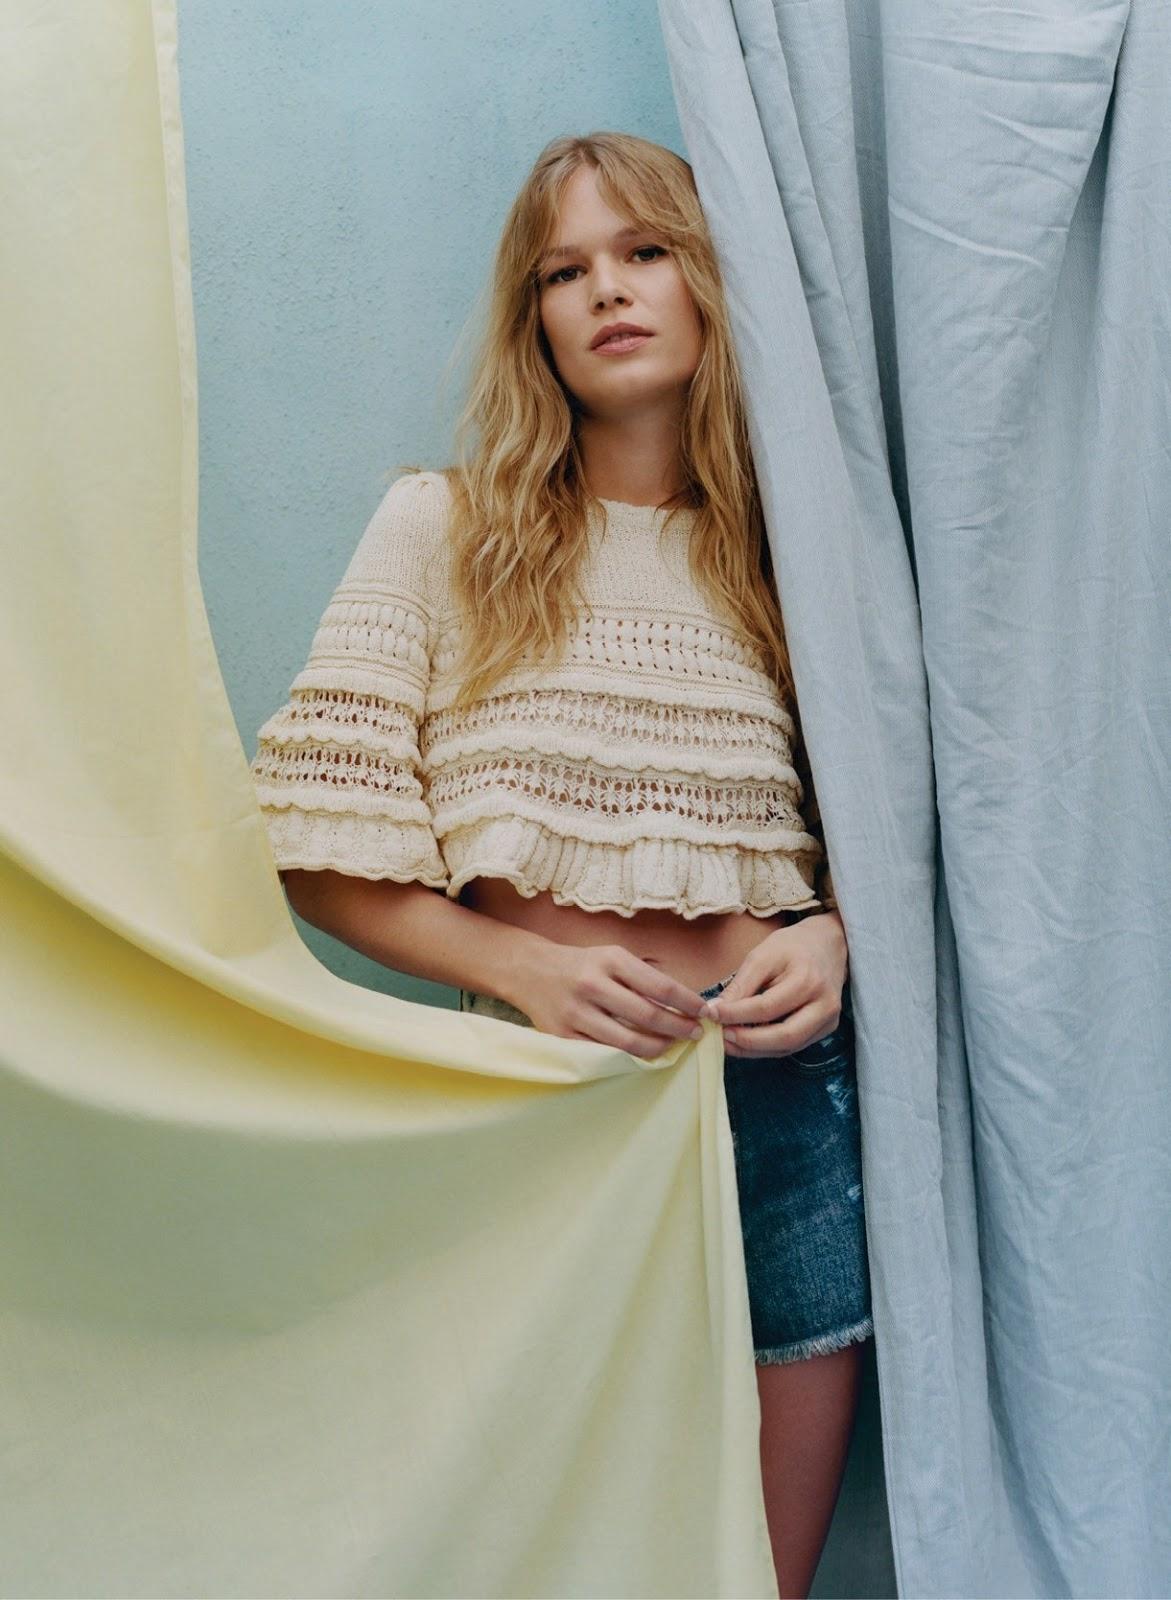 Anna Ewers - Isabel Marant top and Givenchy shorts